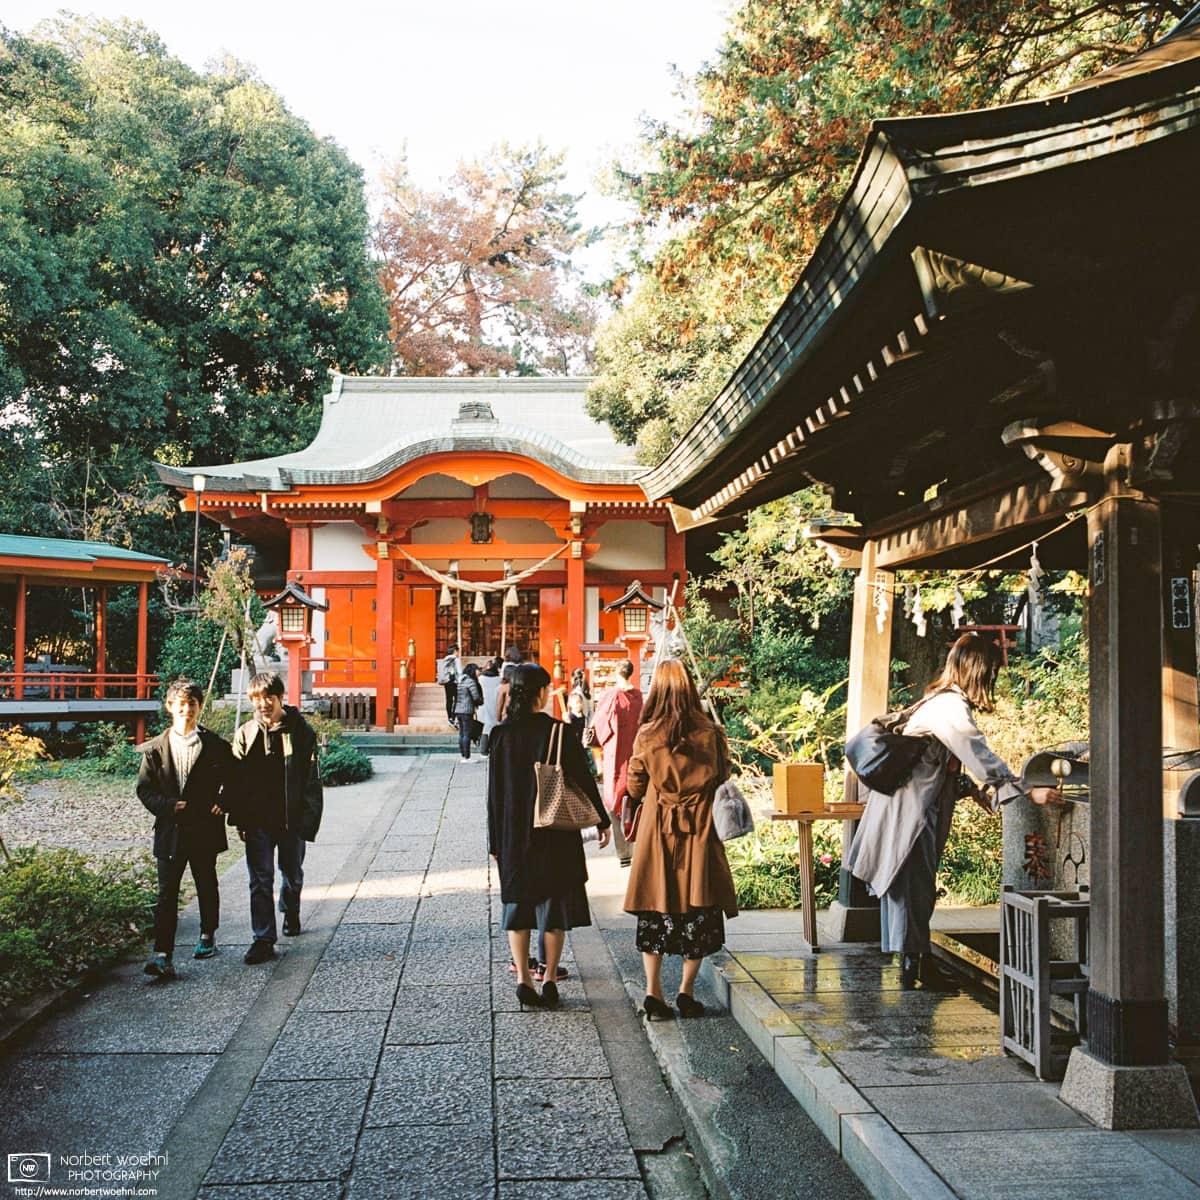 A bright autumn day at Jiyugaoka Kumano Jinja, a small shrine in the Meguro ward of Tokyo, Japan.